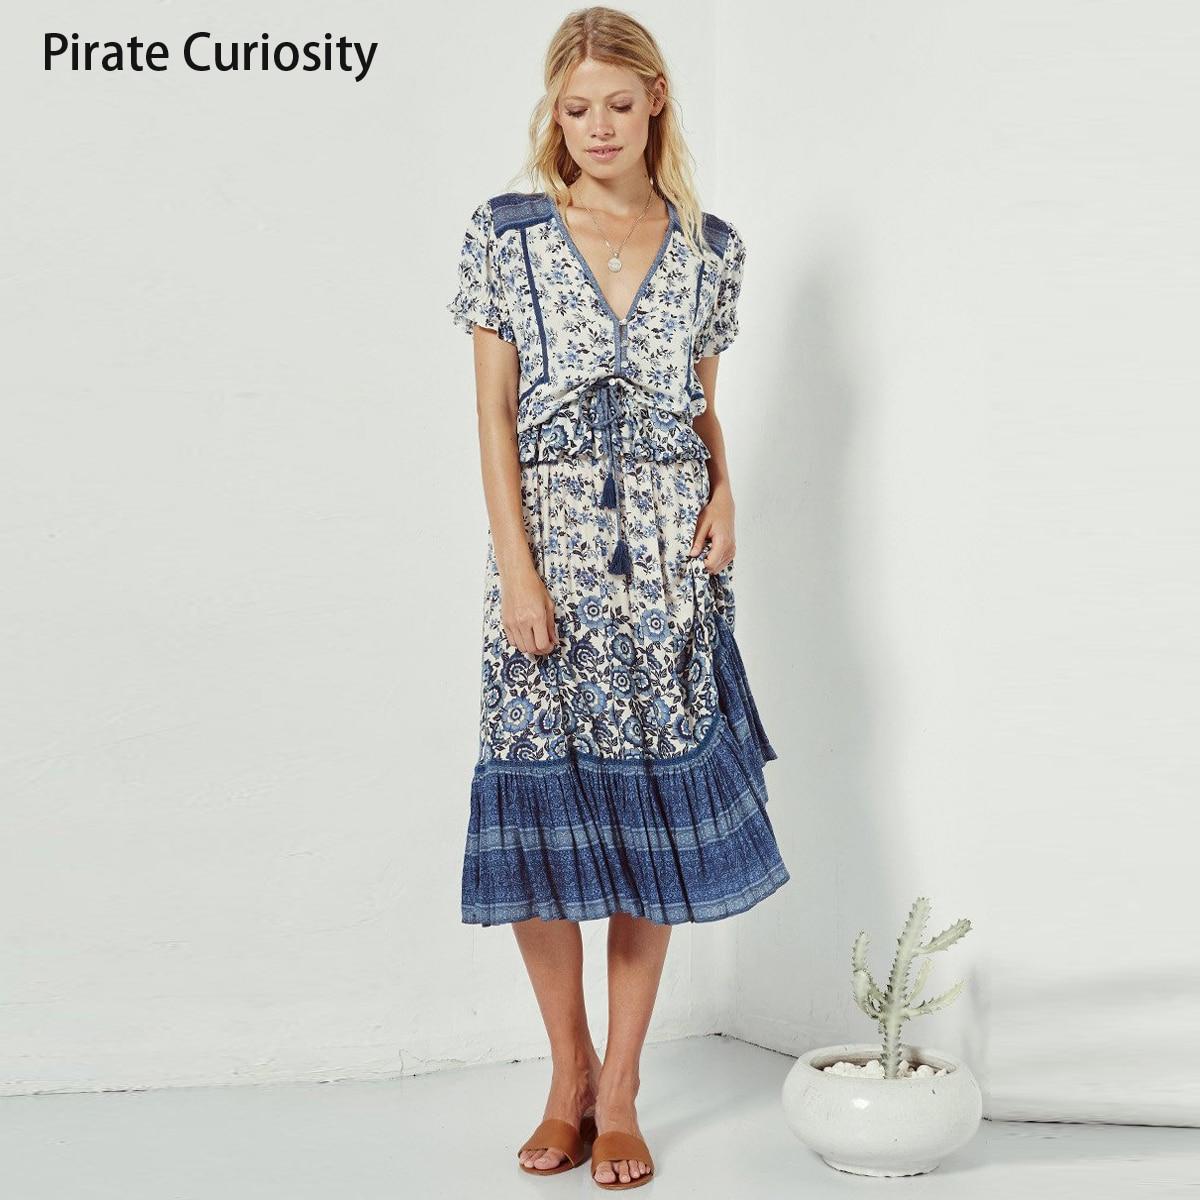 2a1ea53b9f223 Pirate Curiosity Gypsy Indigo Boho Summer Shirt Top V Neck Short ...